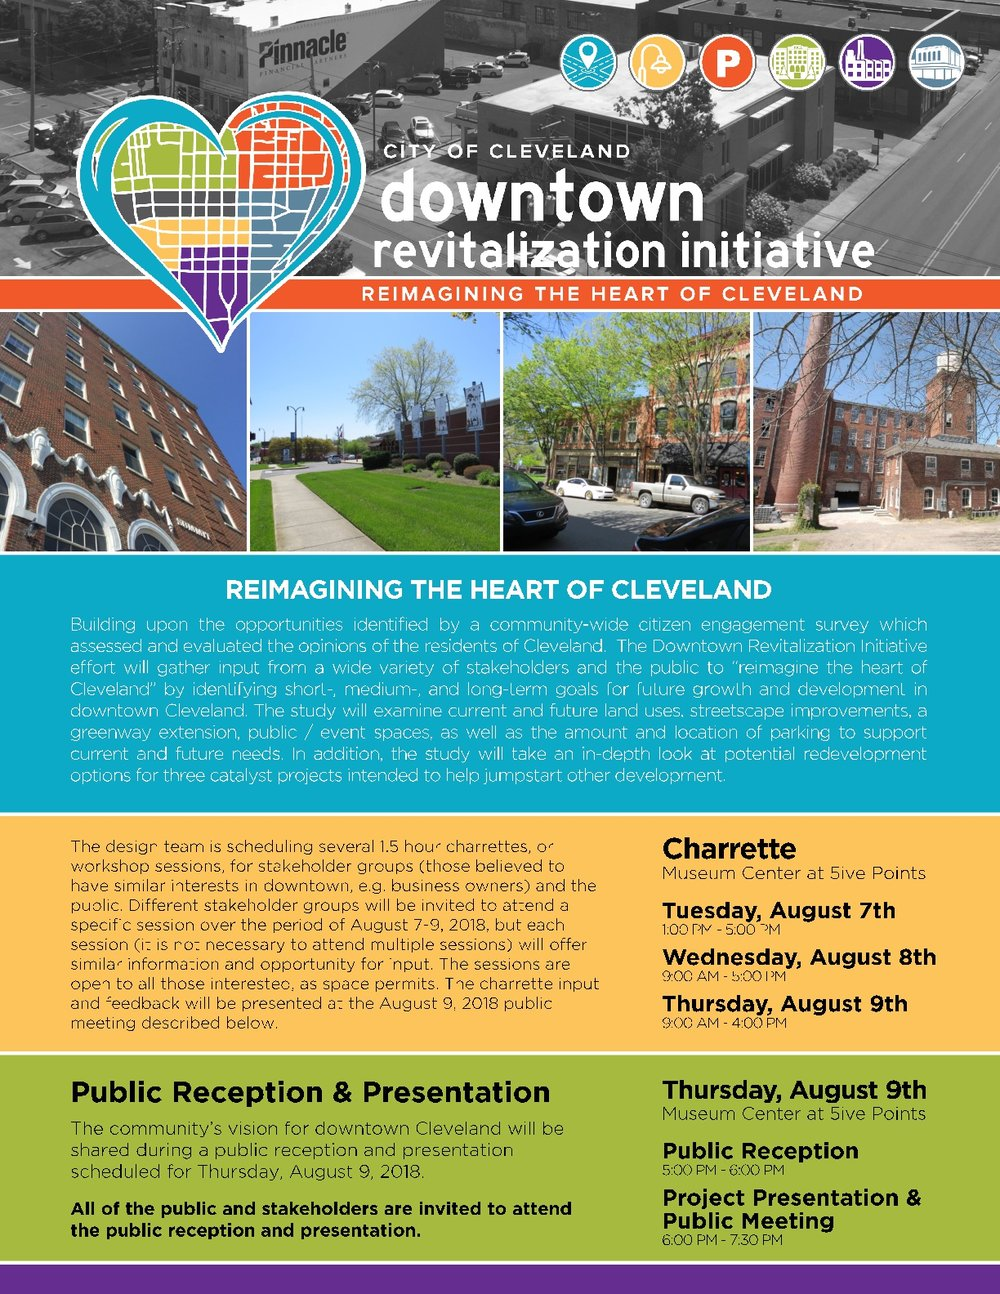 Cleveland Downtown Revitalization Initiative Charrette August 7-9, 2018-001.jpg